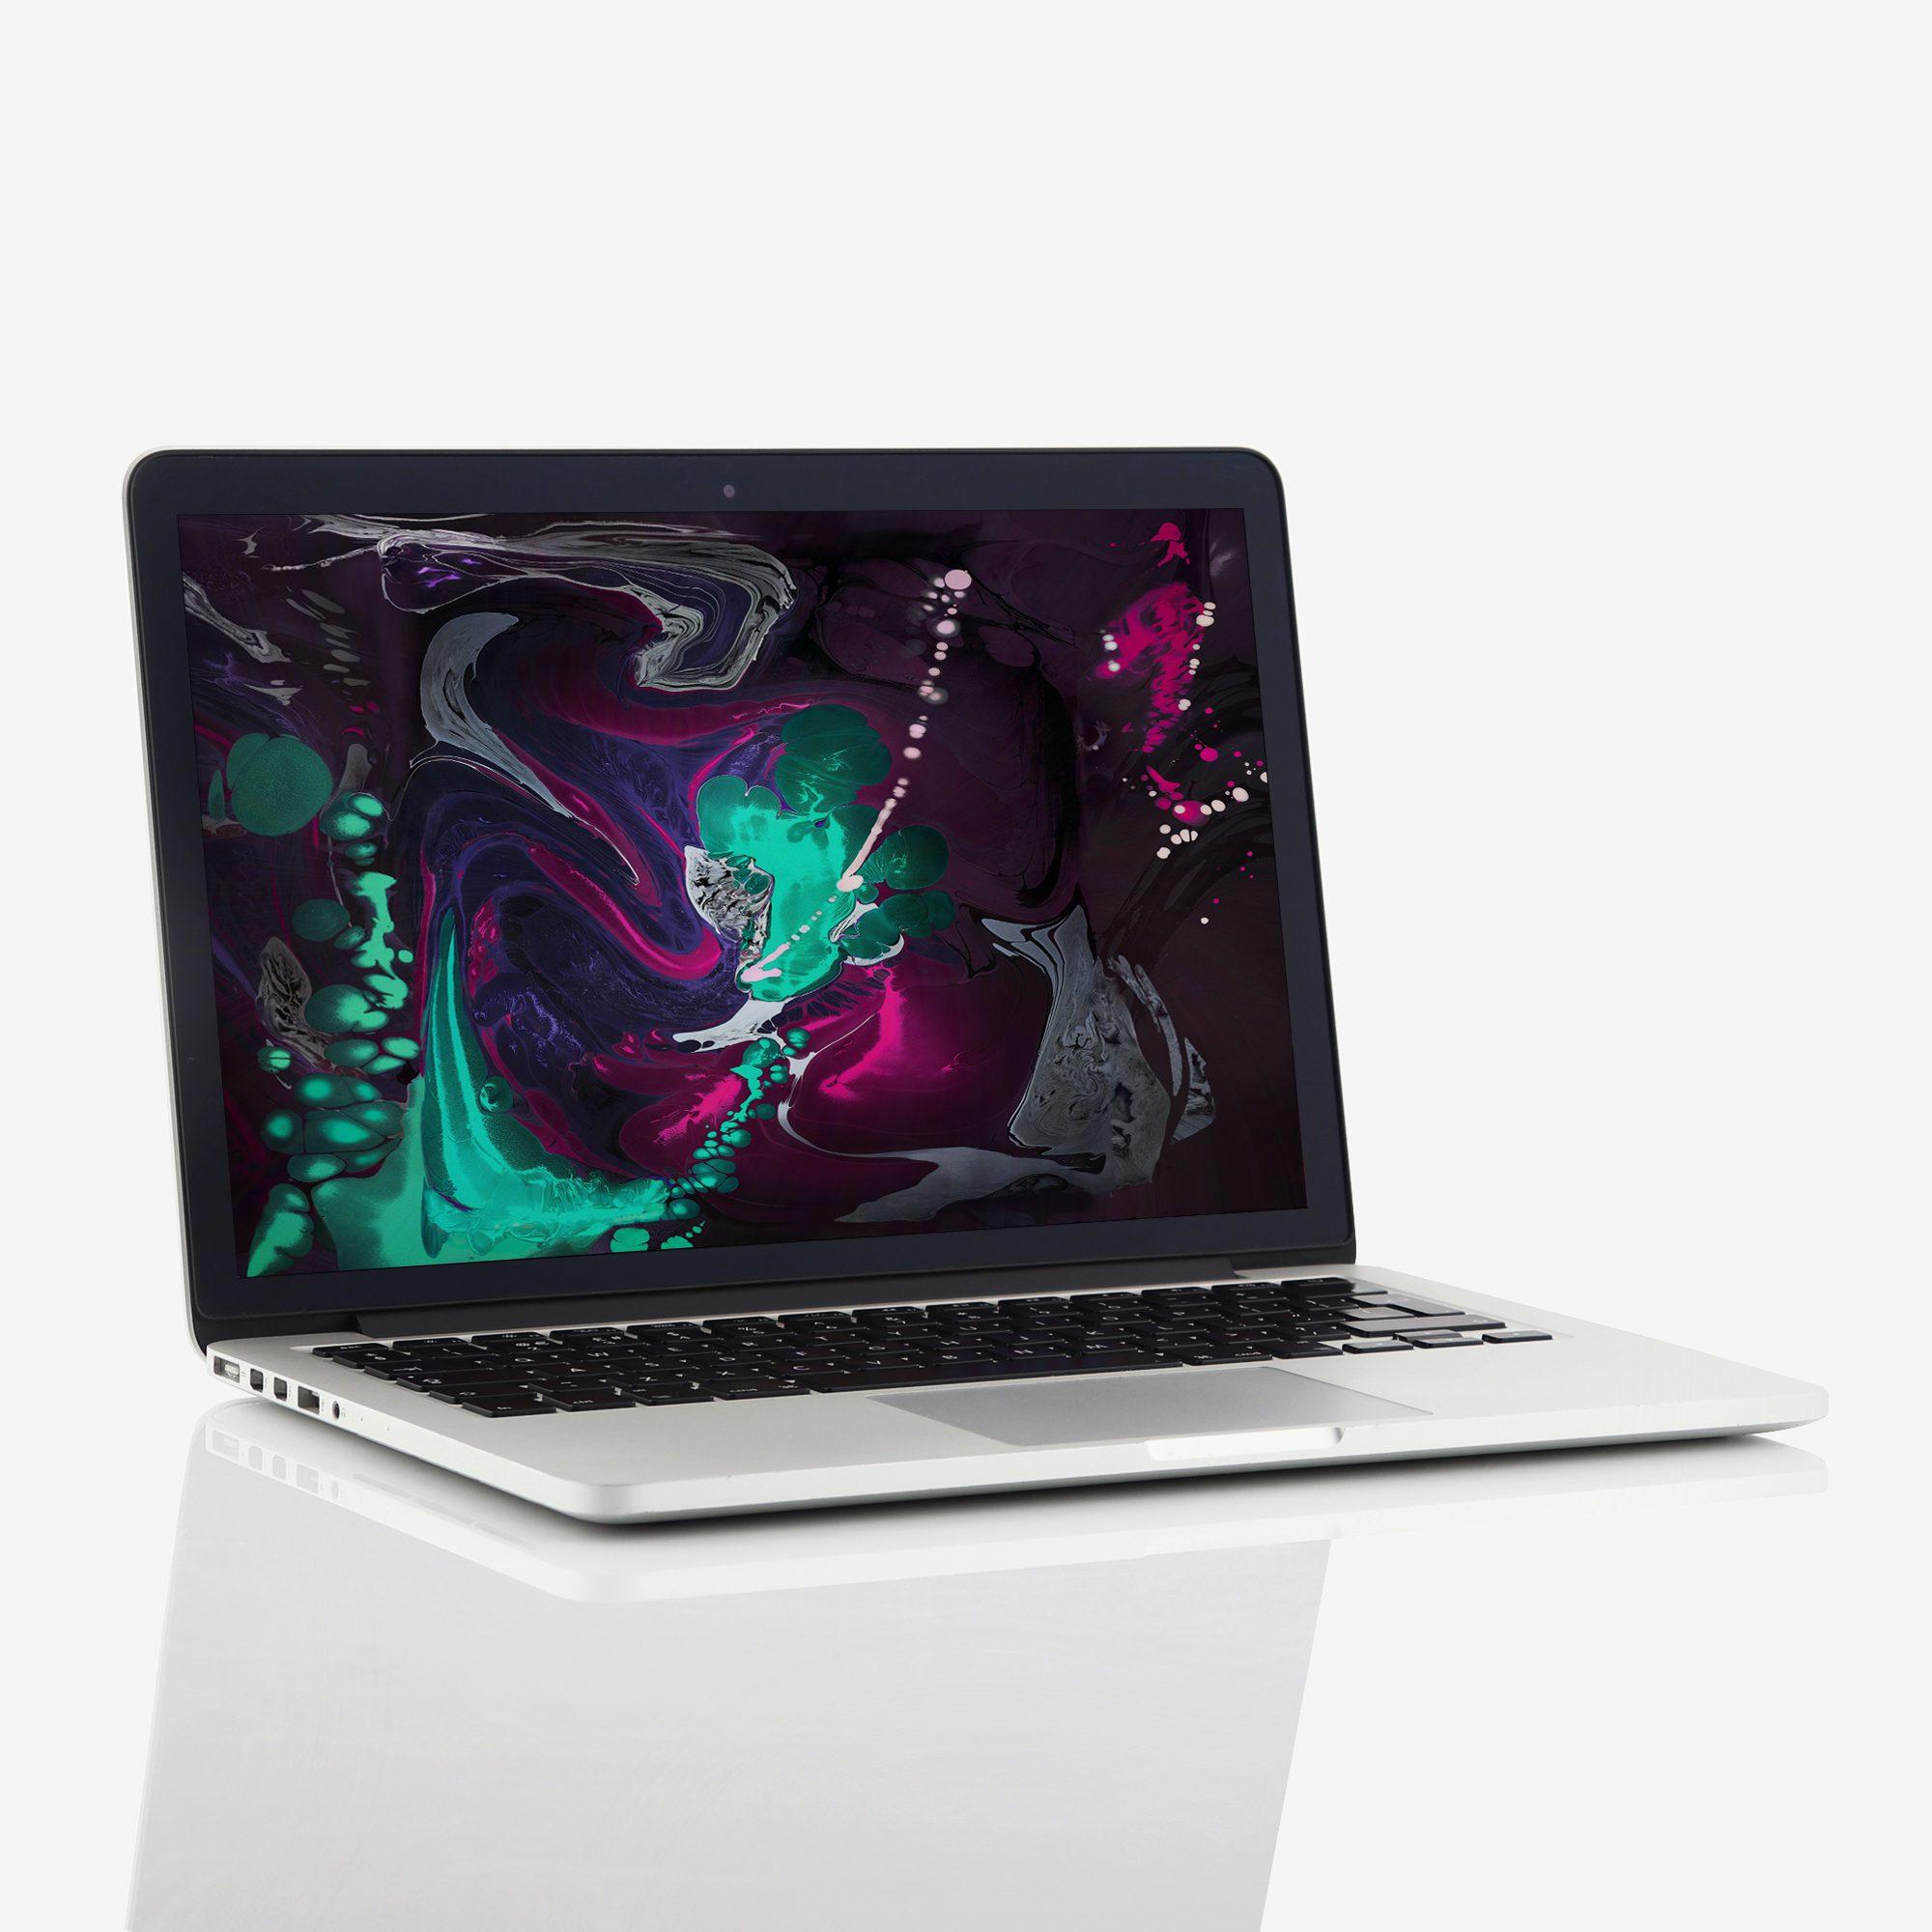 1 x Apple MacBook Pro Retina 13 Inch Intel Core i5 2.70 GHz (2015)